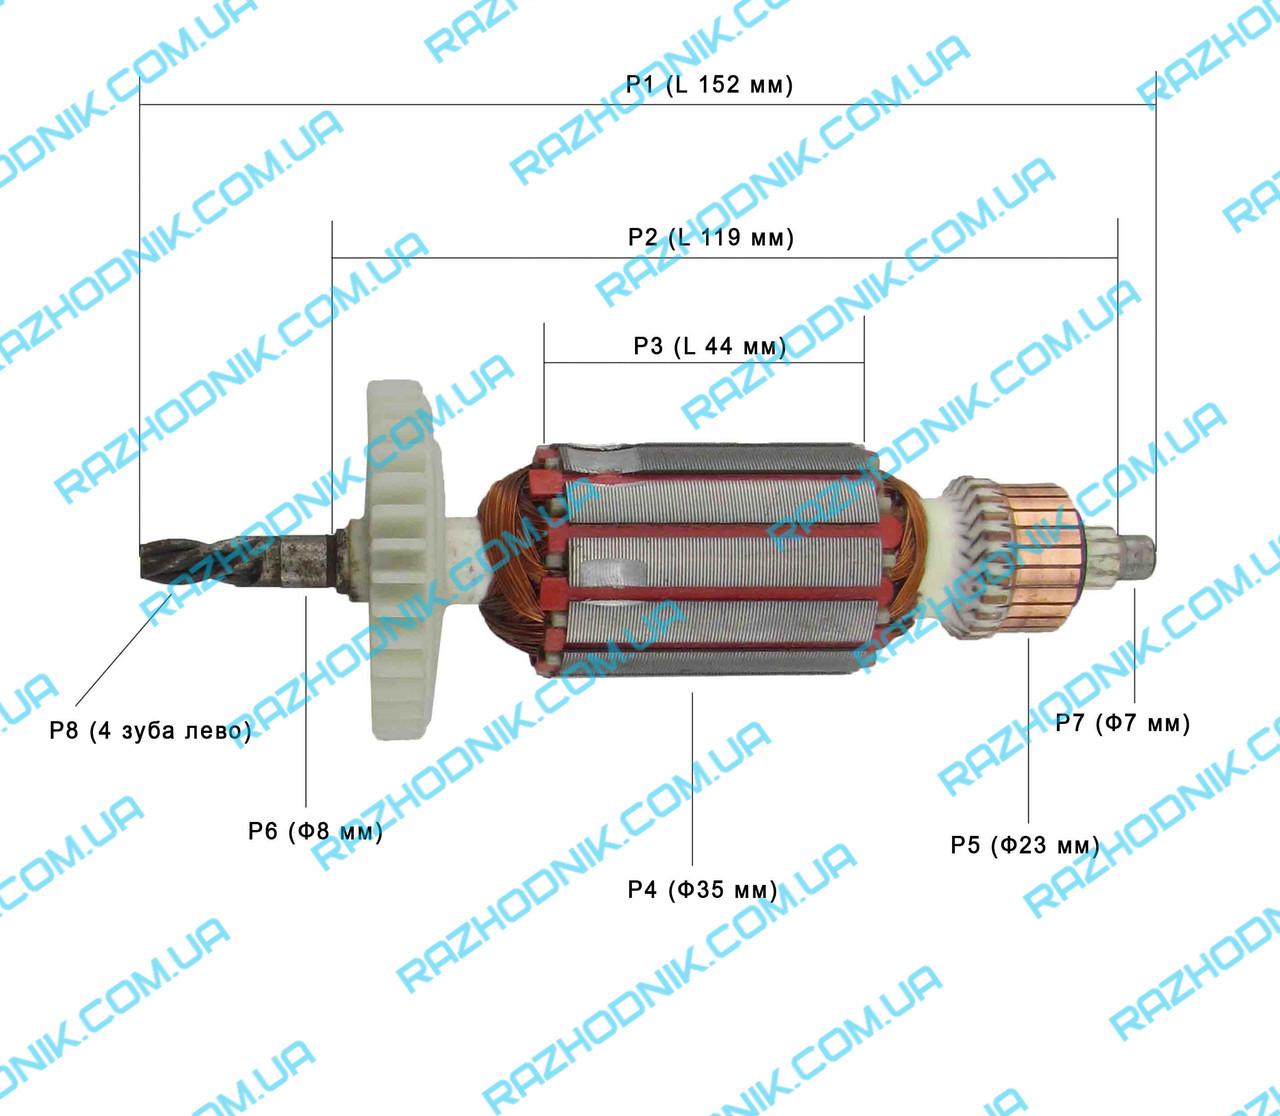 Якорь на дрель ТЕМП ДЭУ-750, CRAFT-TEC CXID-220